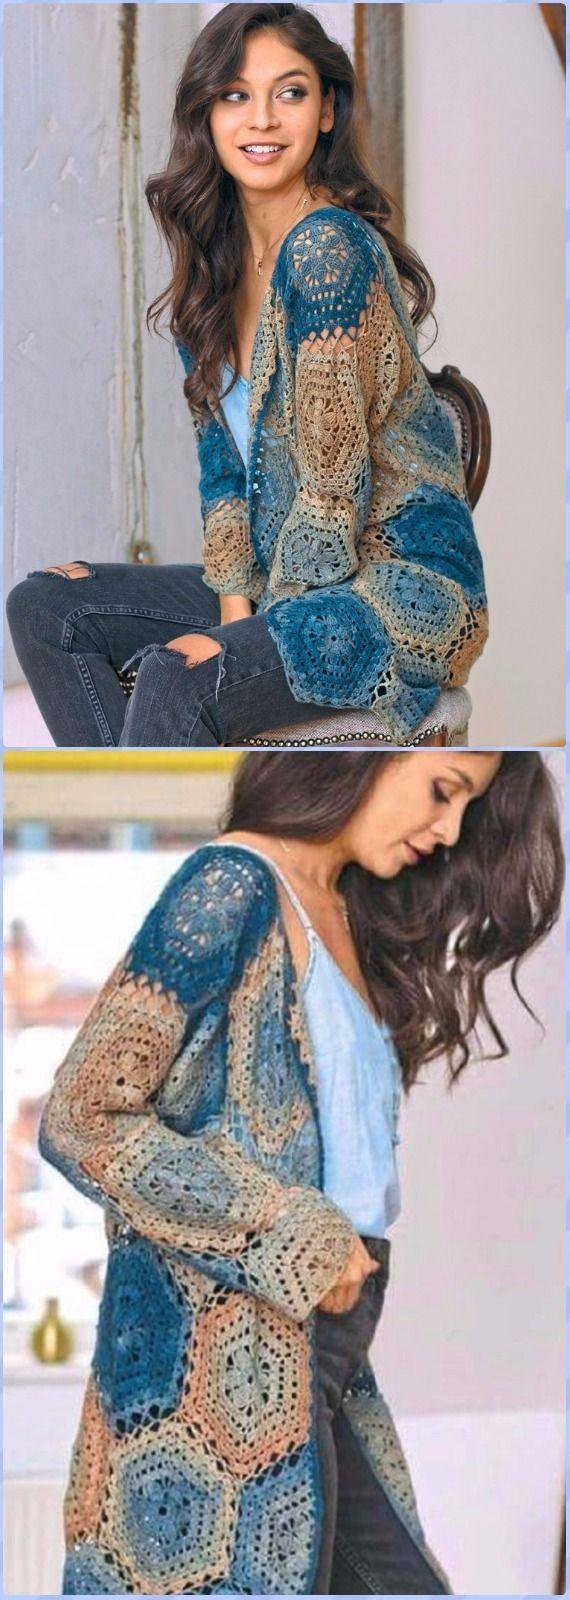 Photo of Crochet tunic